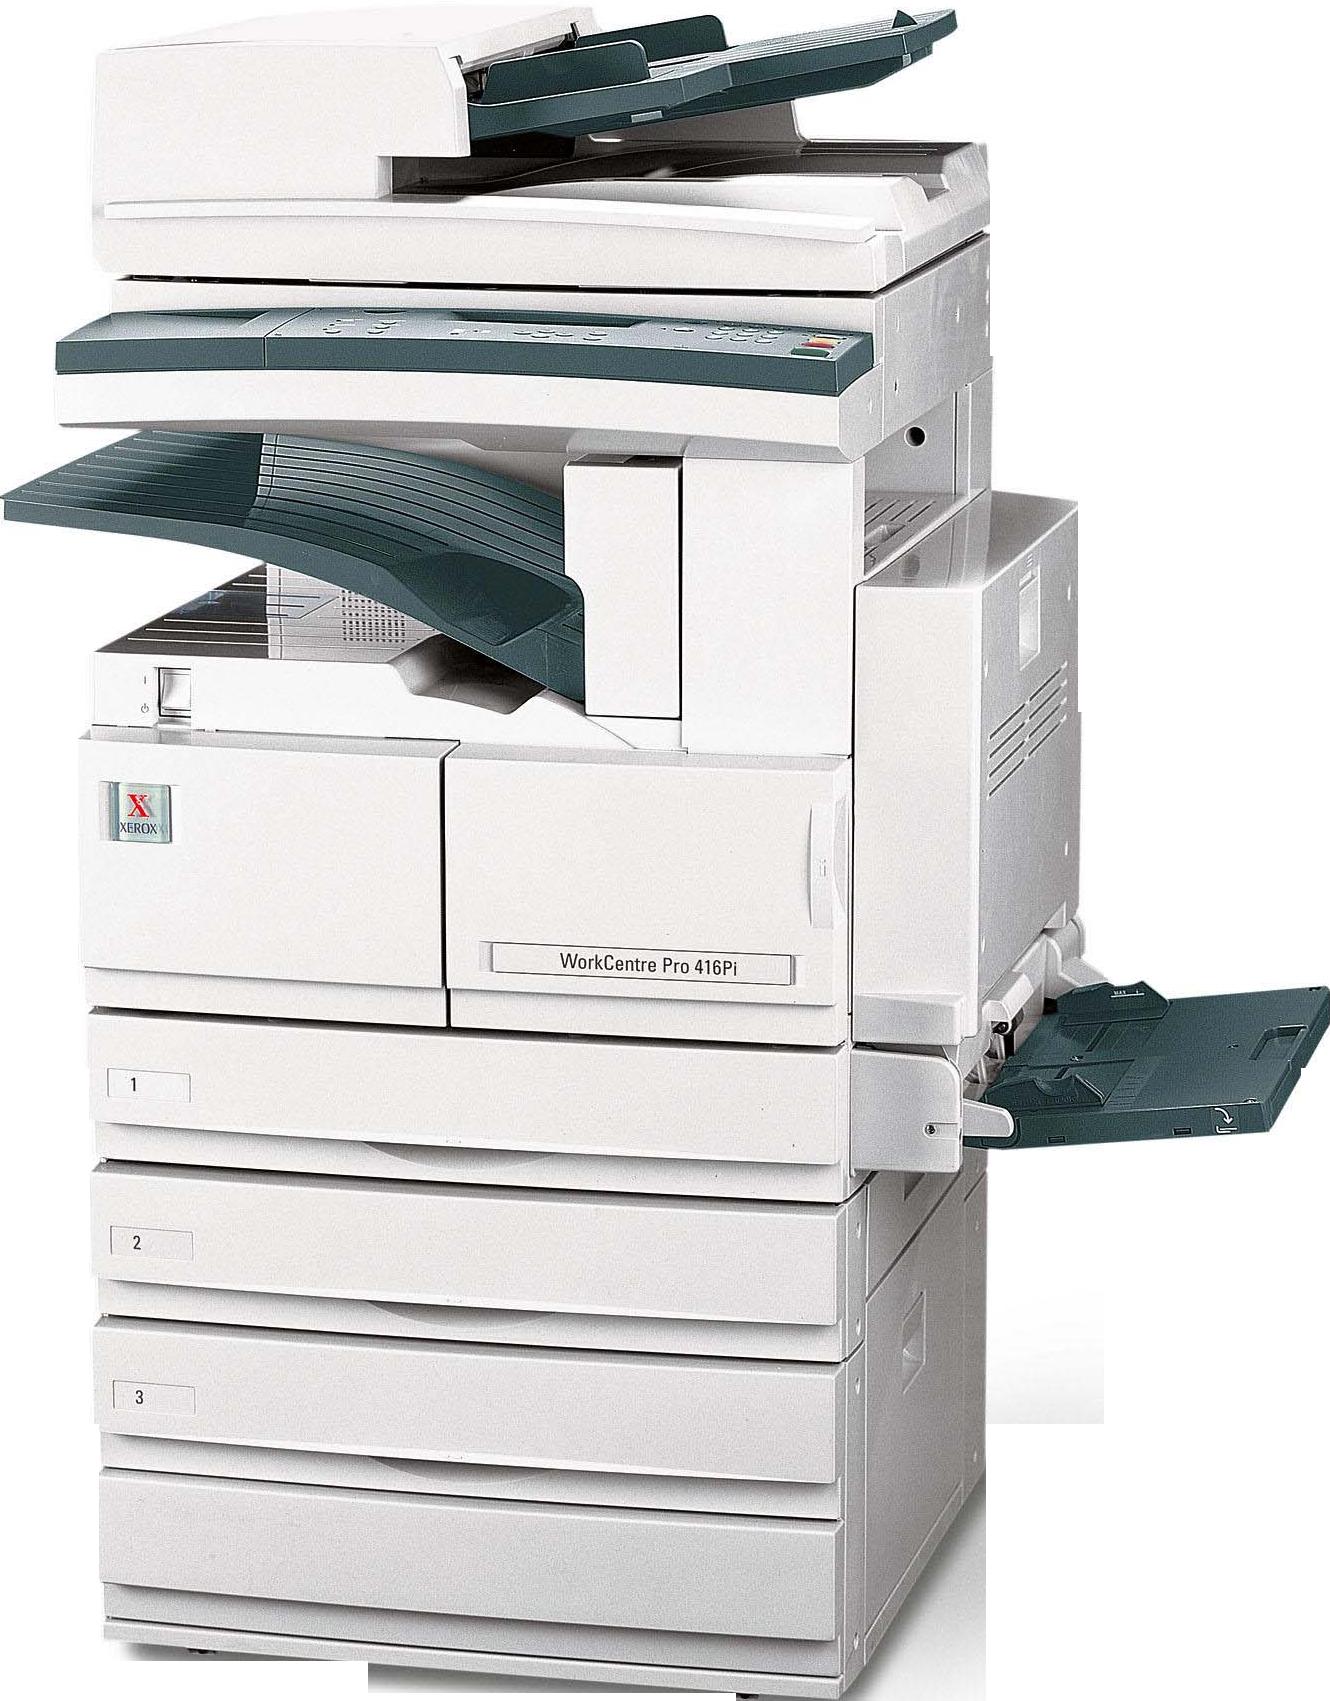 Best Deals On Business Copier Machines Copiers For